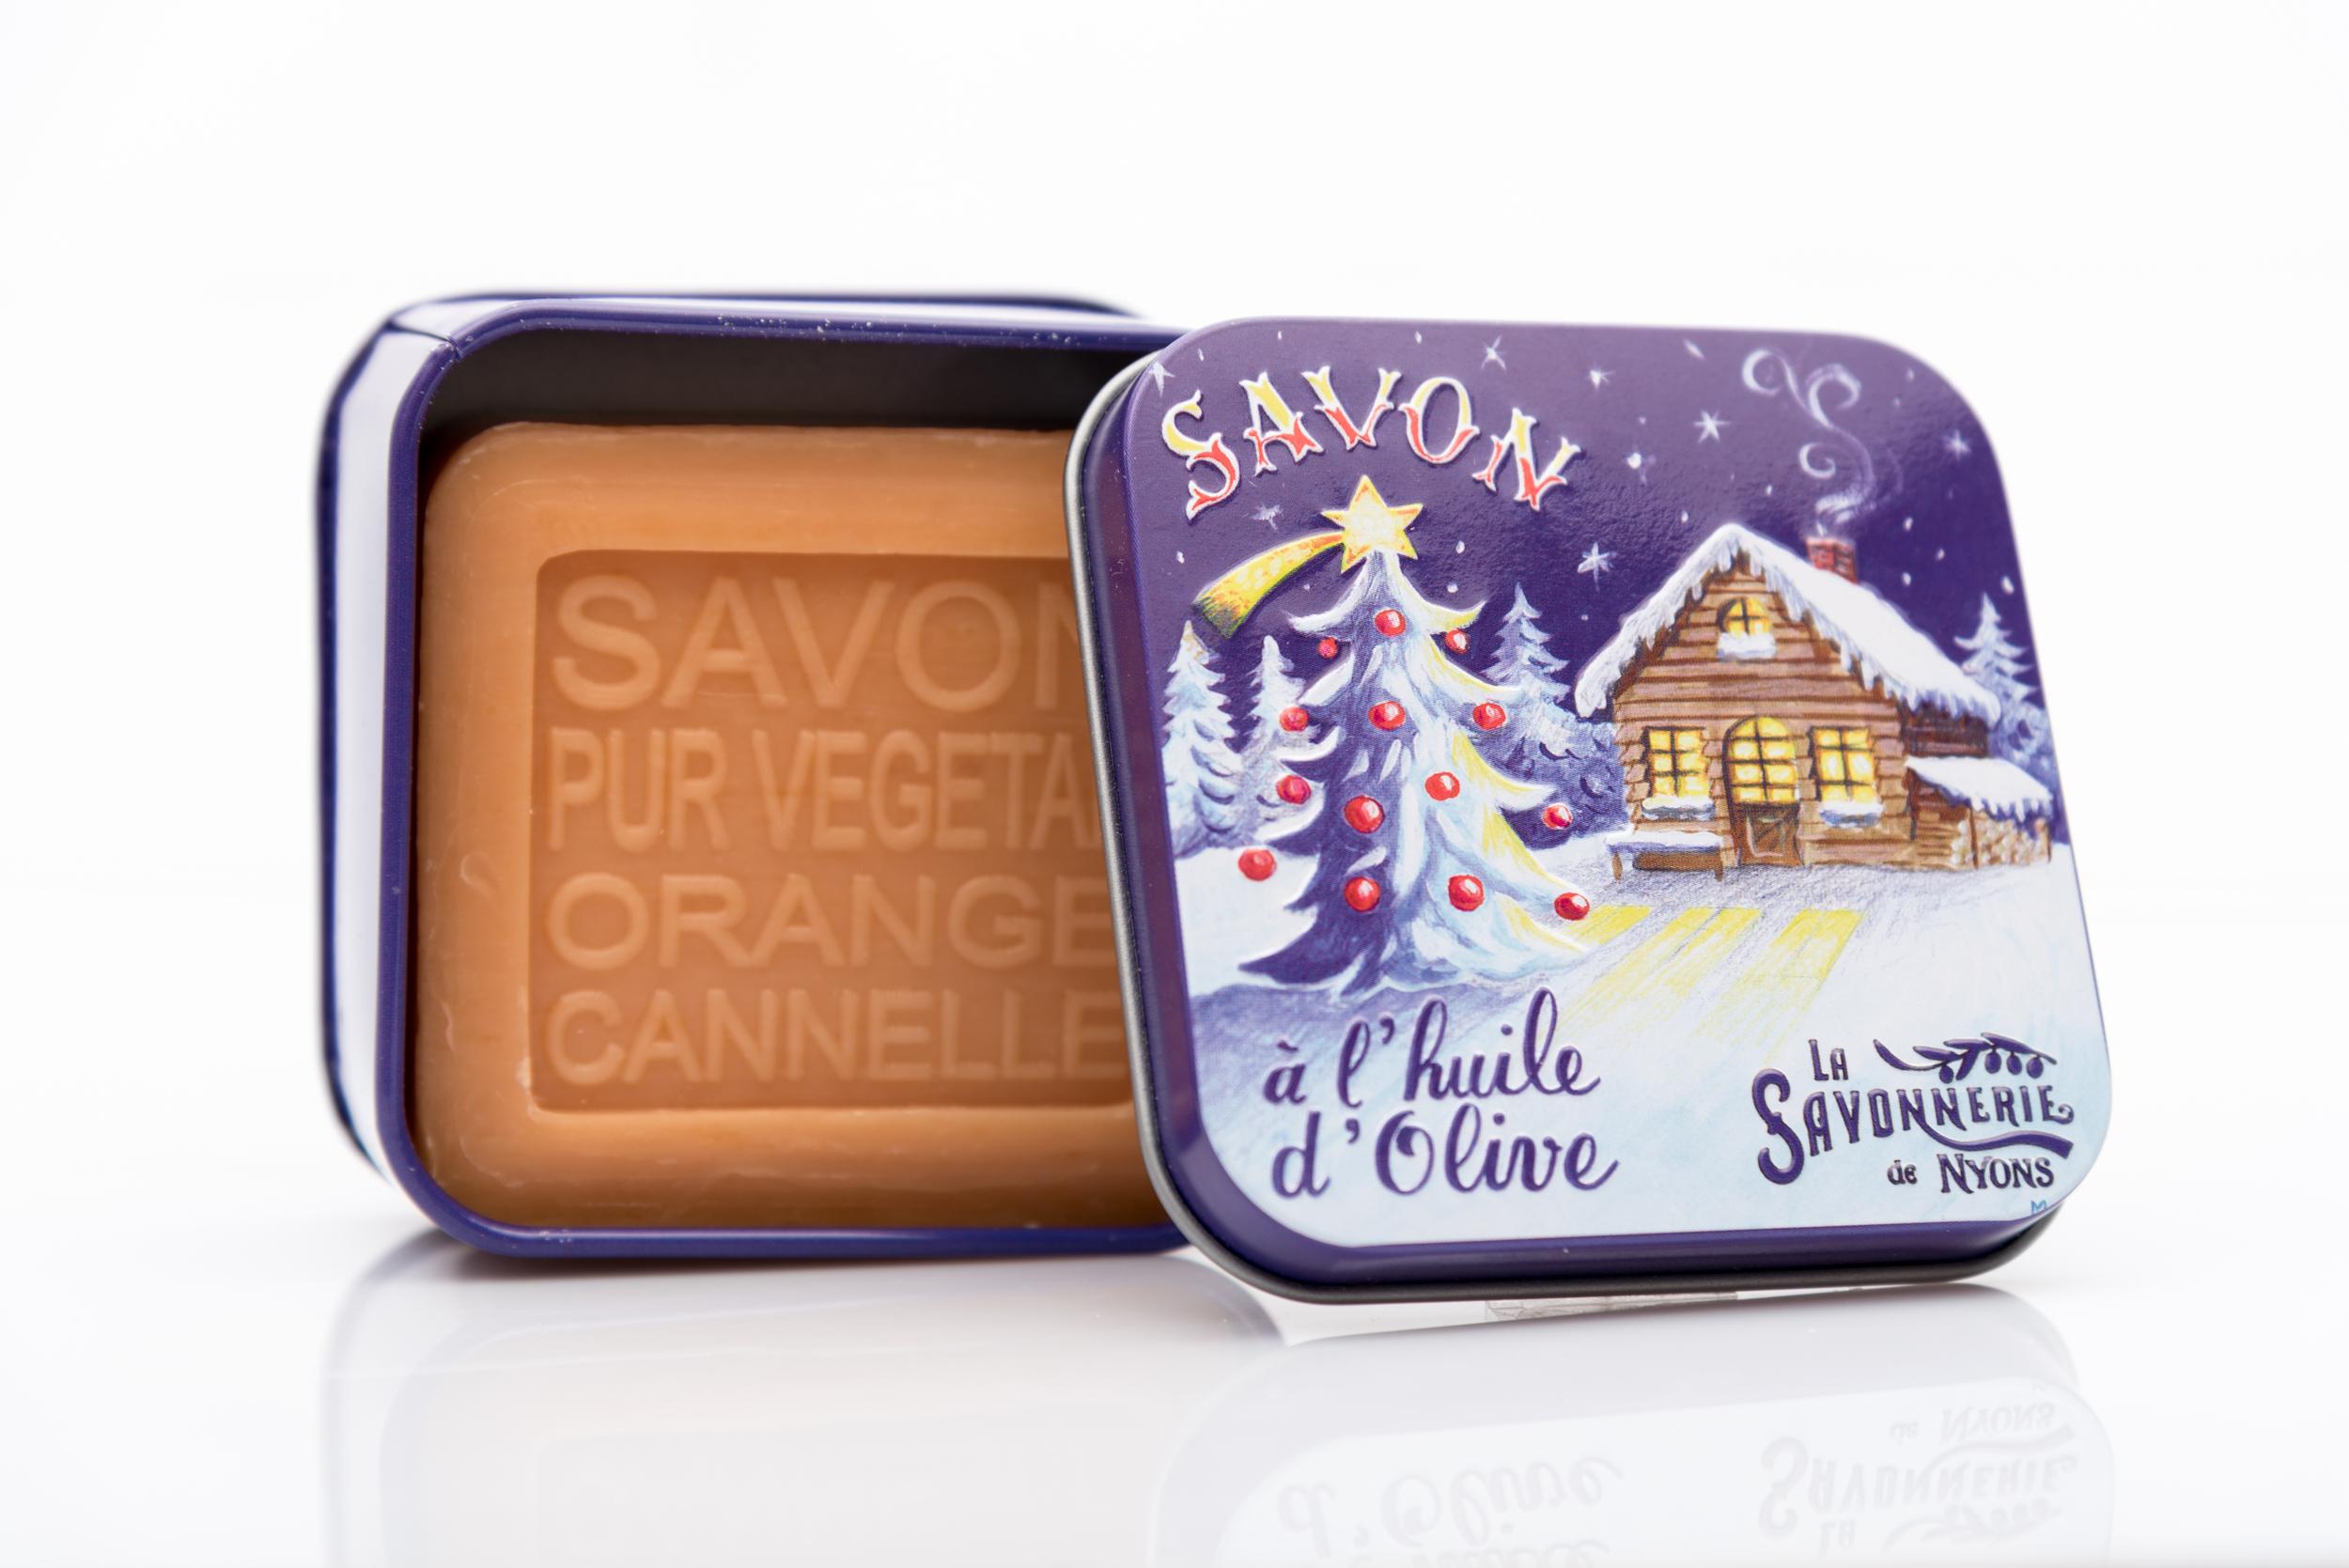 SAVON DE NYONS VEGETAL MADE IN FRANCE AVEC BOITE METALIQUE MODELE 57 ORANGE CANNELLE